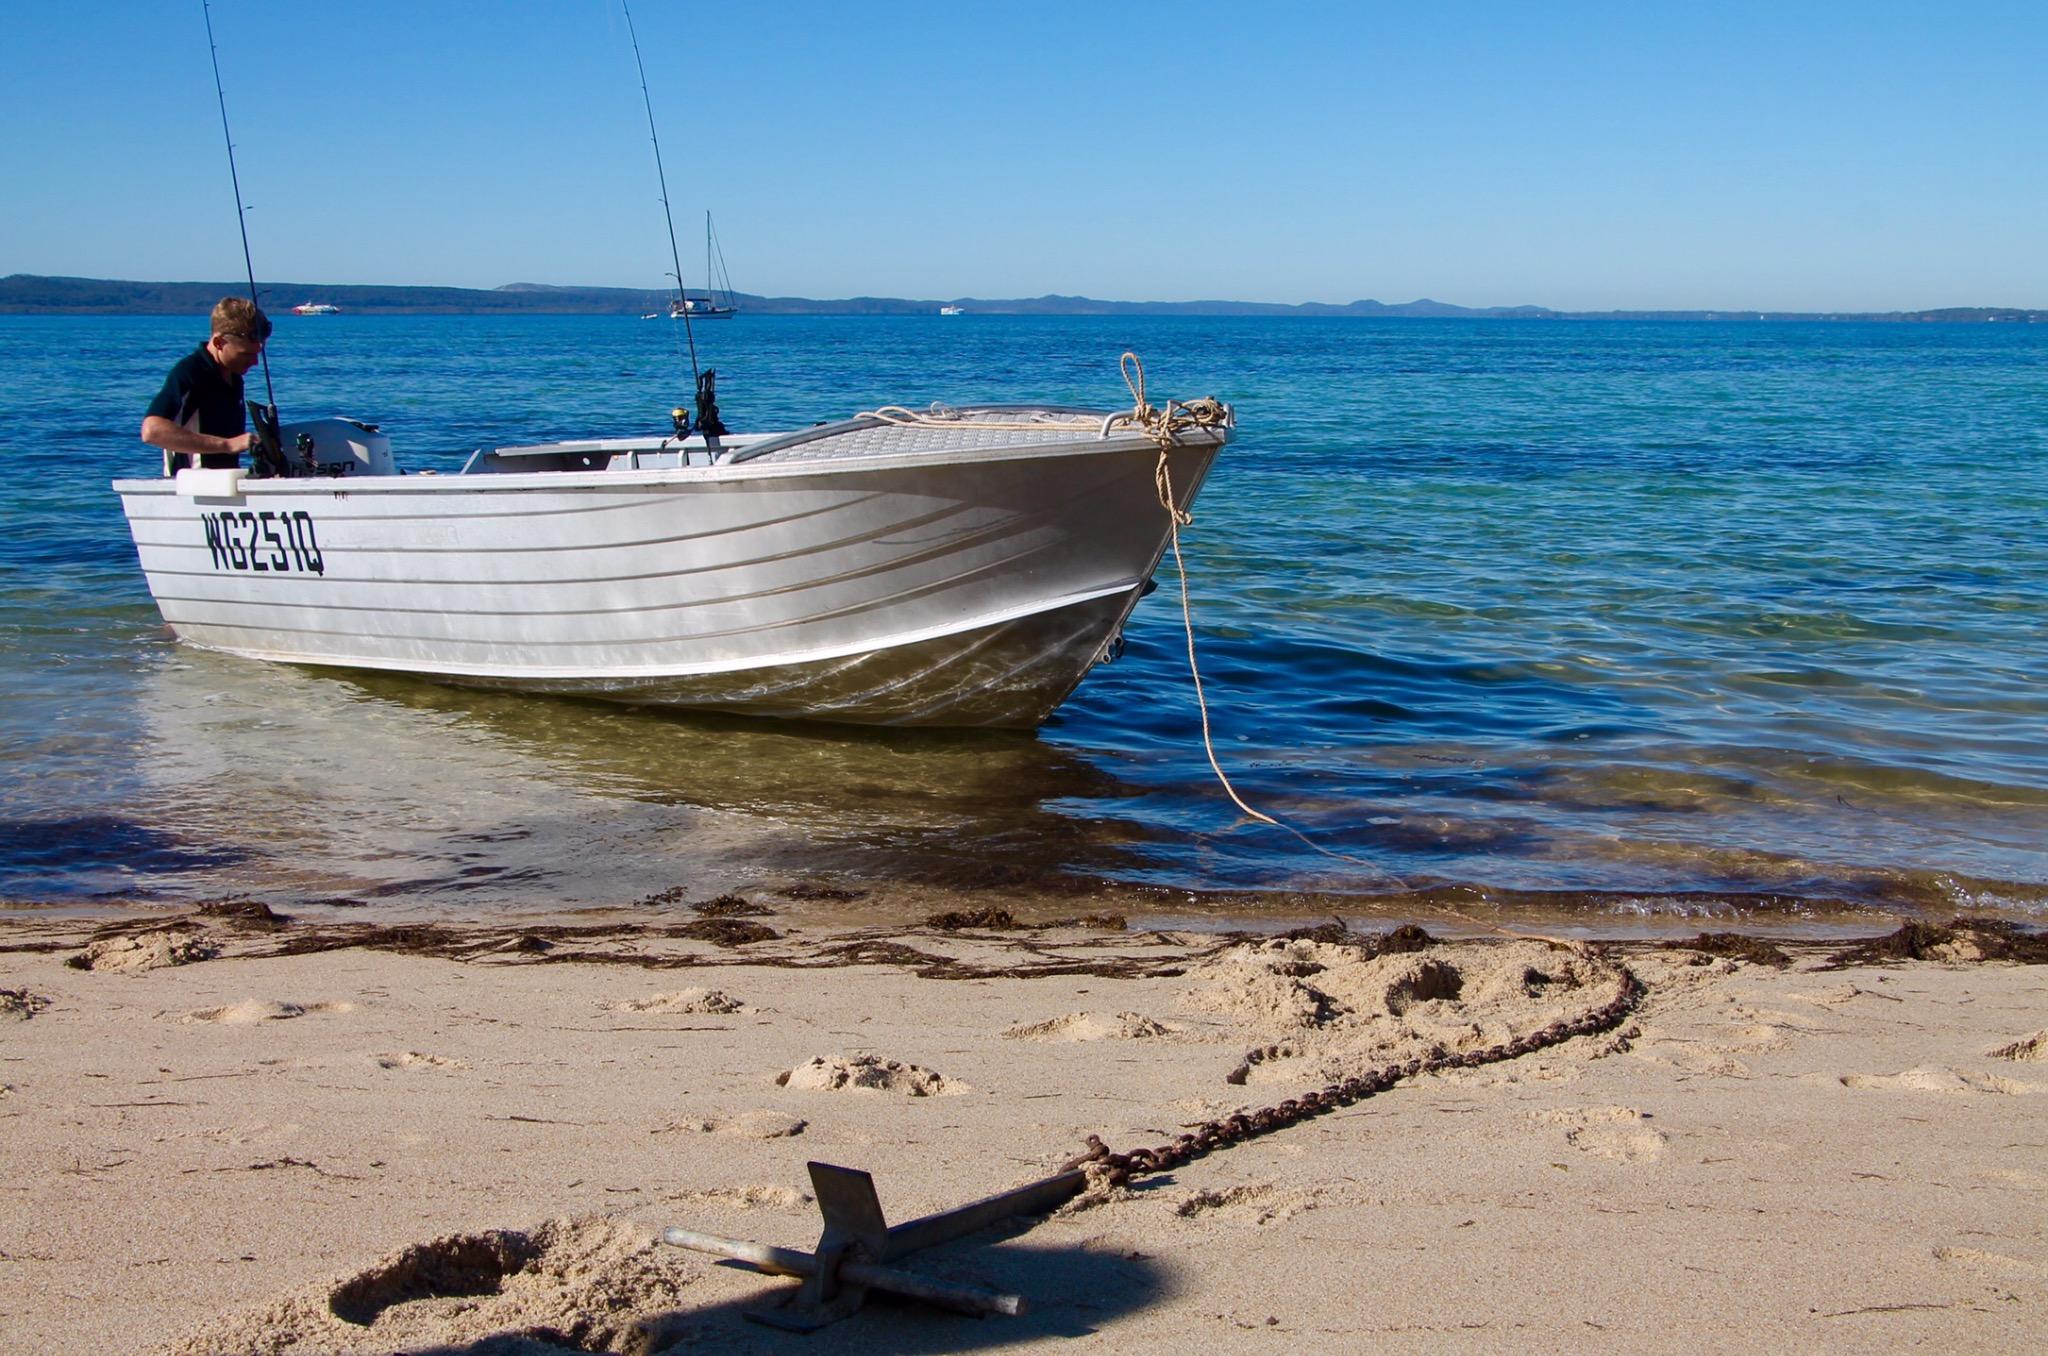 Boat trip to Peel Island.